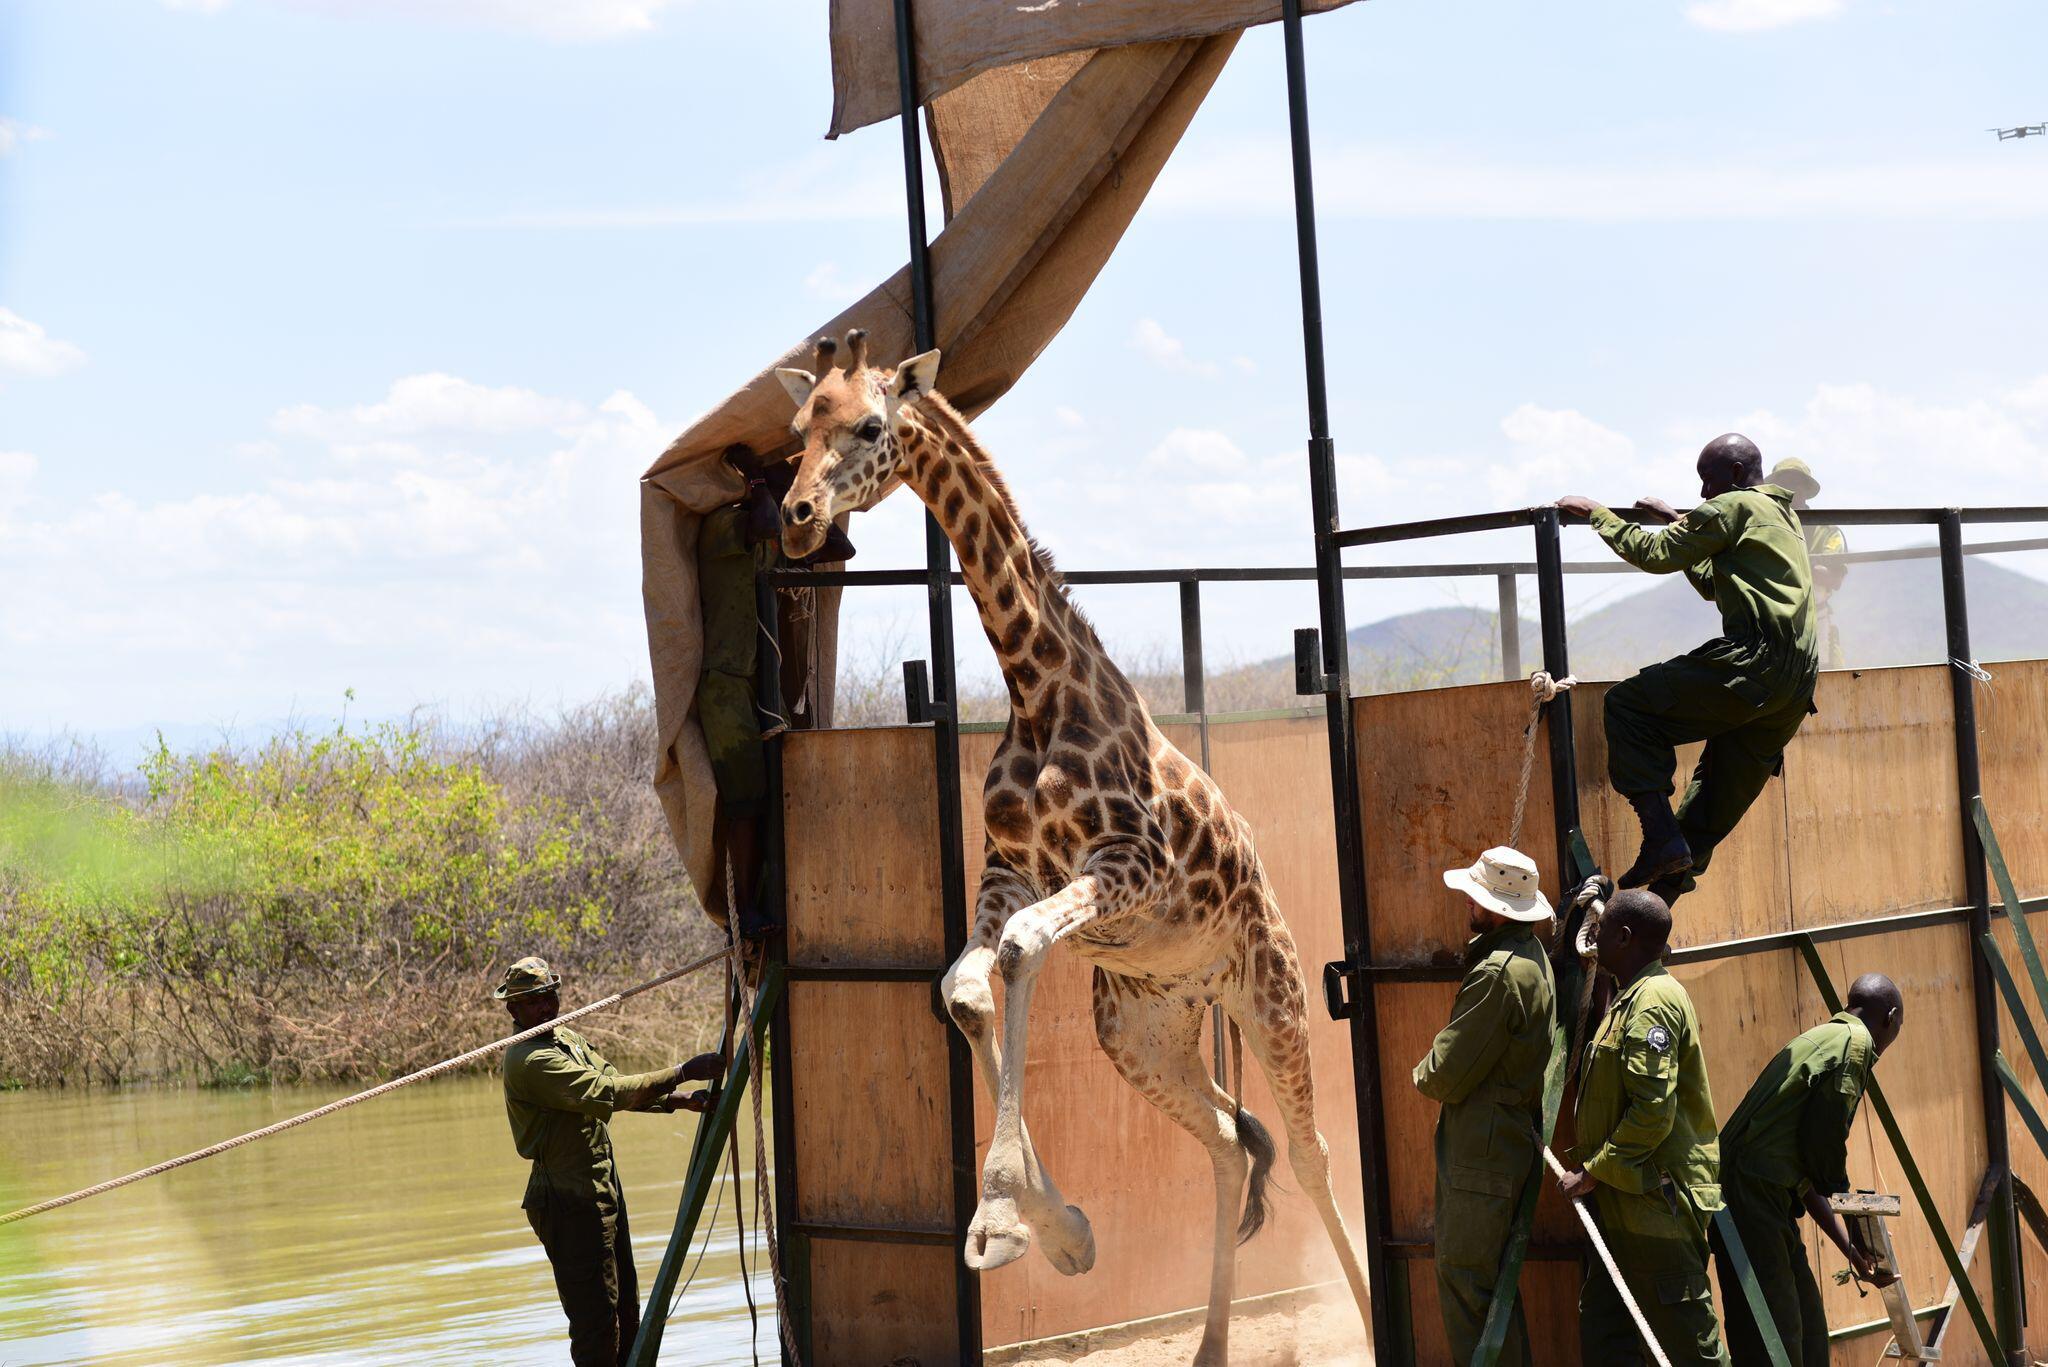 Bild zu Neun Giraffen in Kenia umgesiedelt